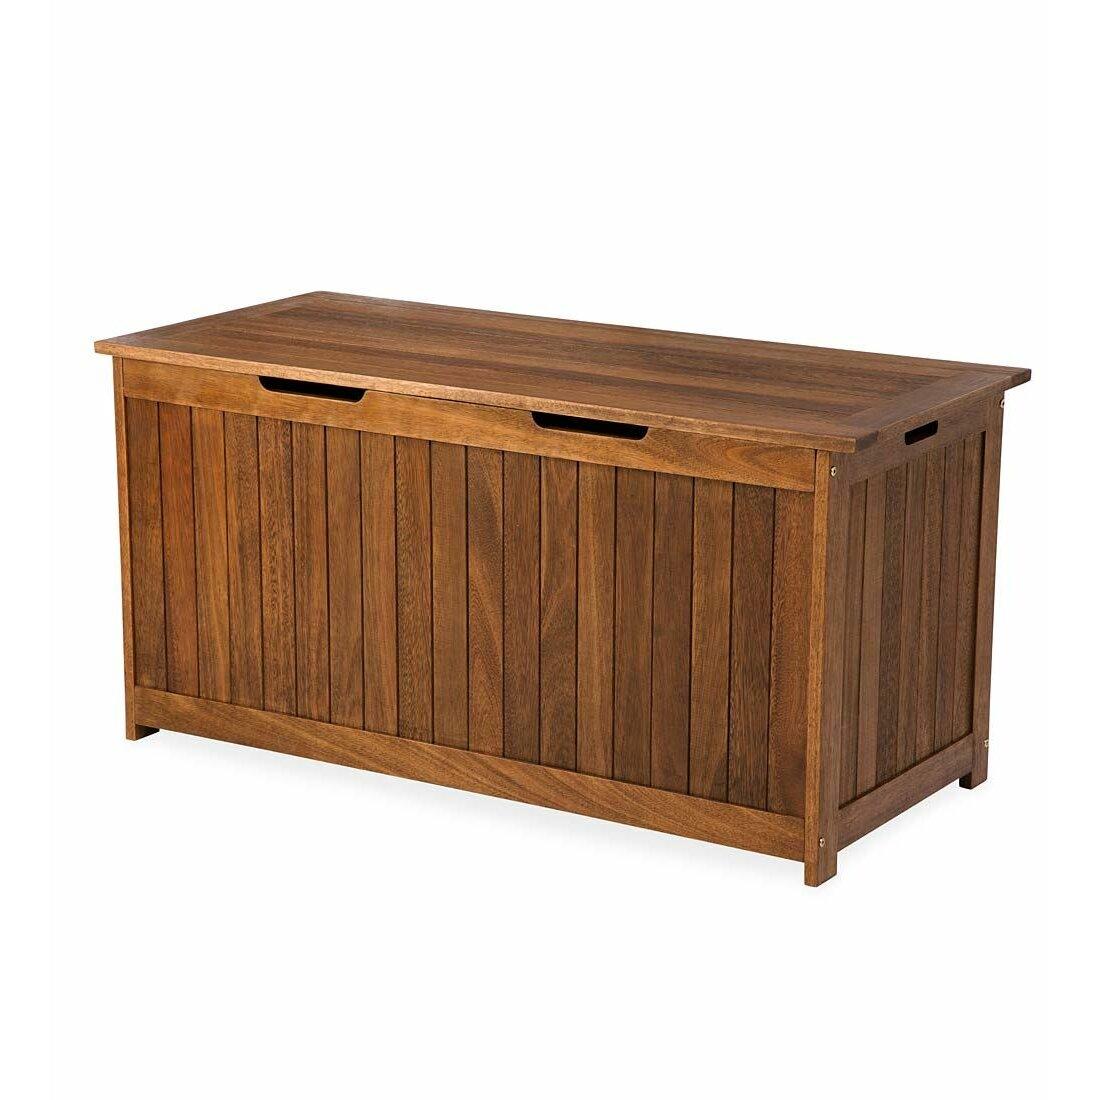 plow hearth lancaster eucalyptus wood deck box reviews wayfair. Black Bedroom Furniture Sets. Home Design Ideas